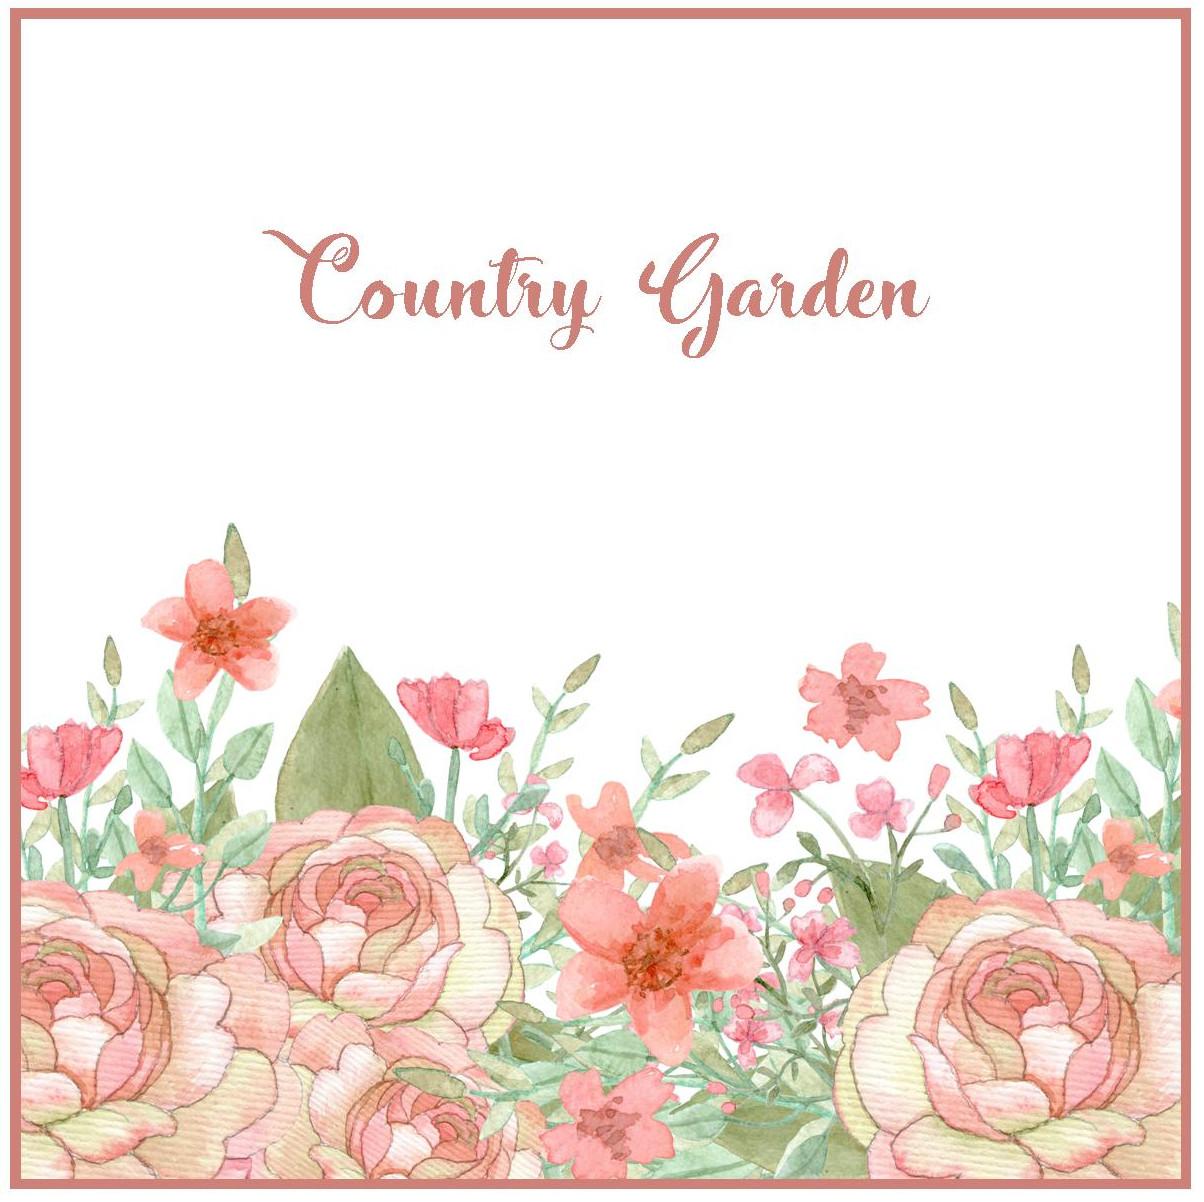 Country garden.jpg